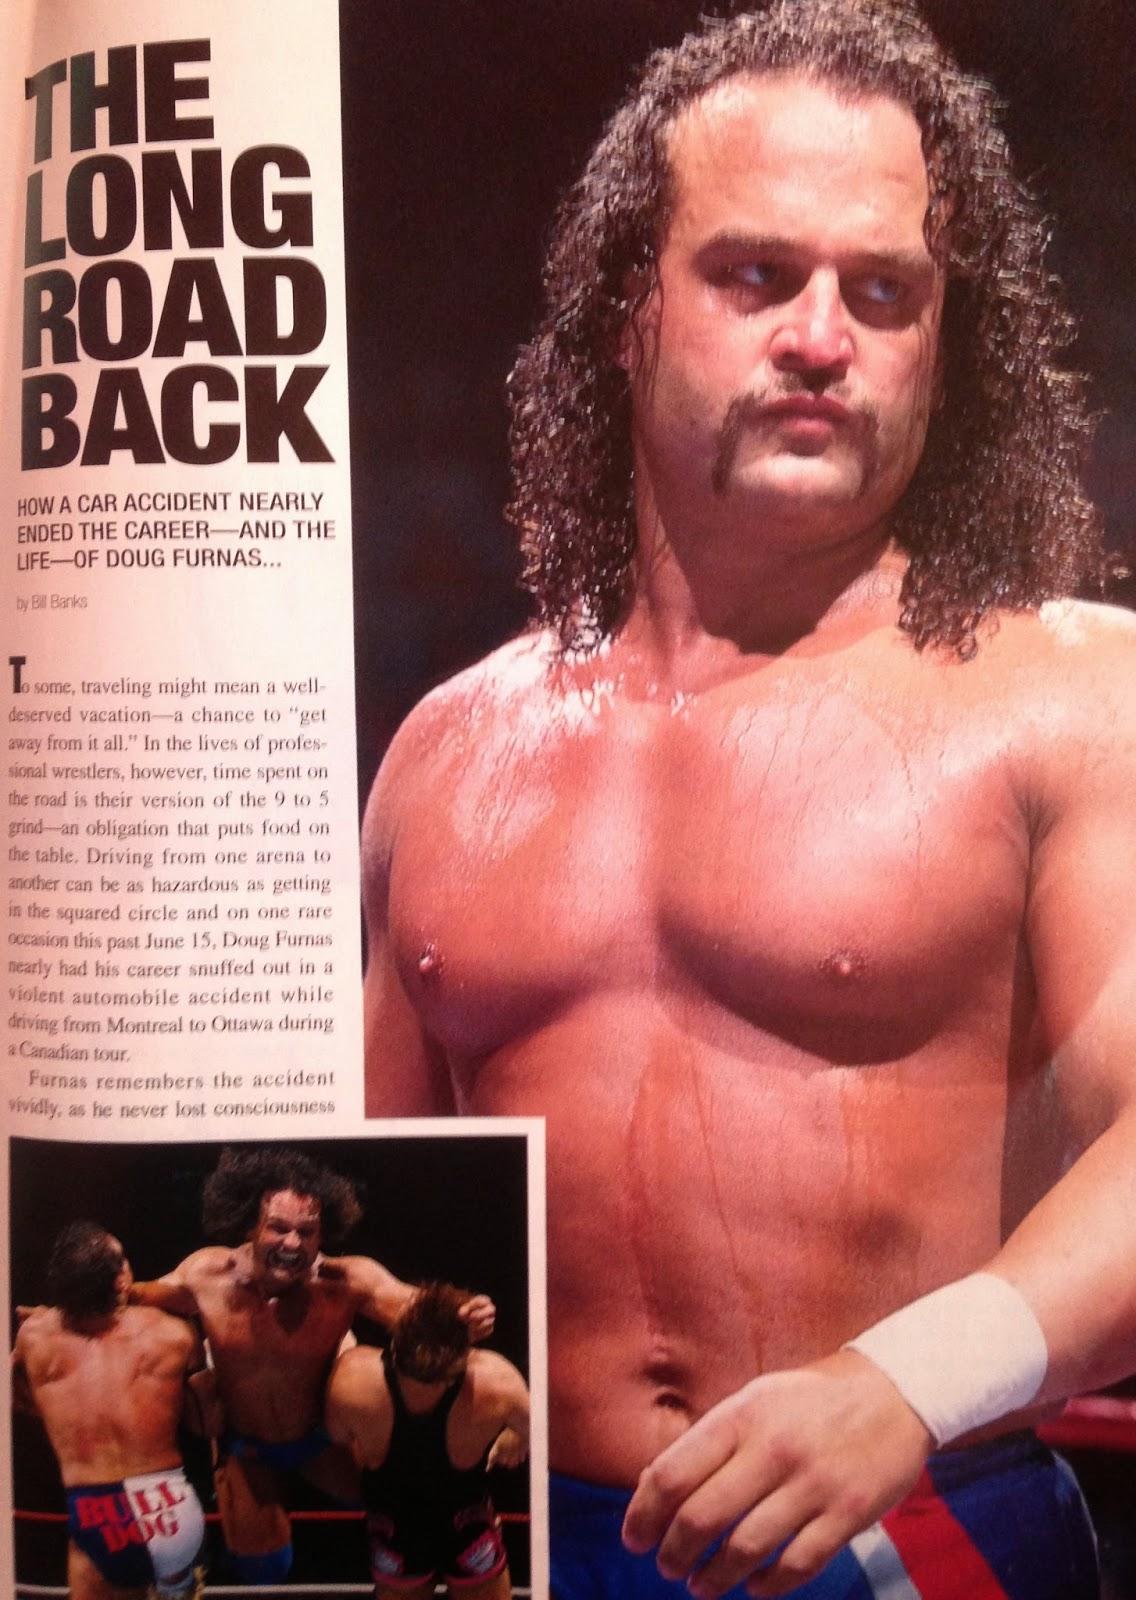 WWE: WWF RAW MAGAZINE - January 1998 - A report on the car crash that nearly killed Doug Furnas